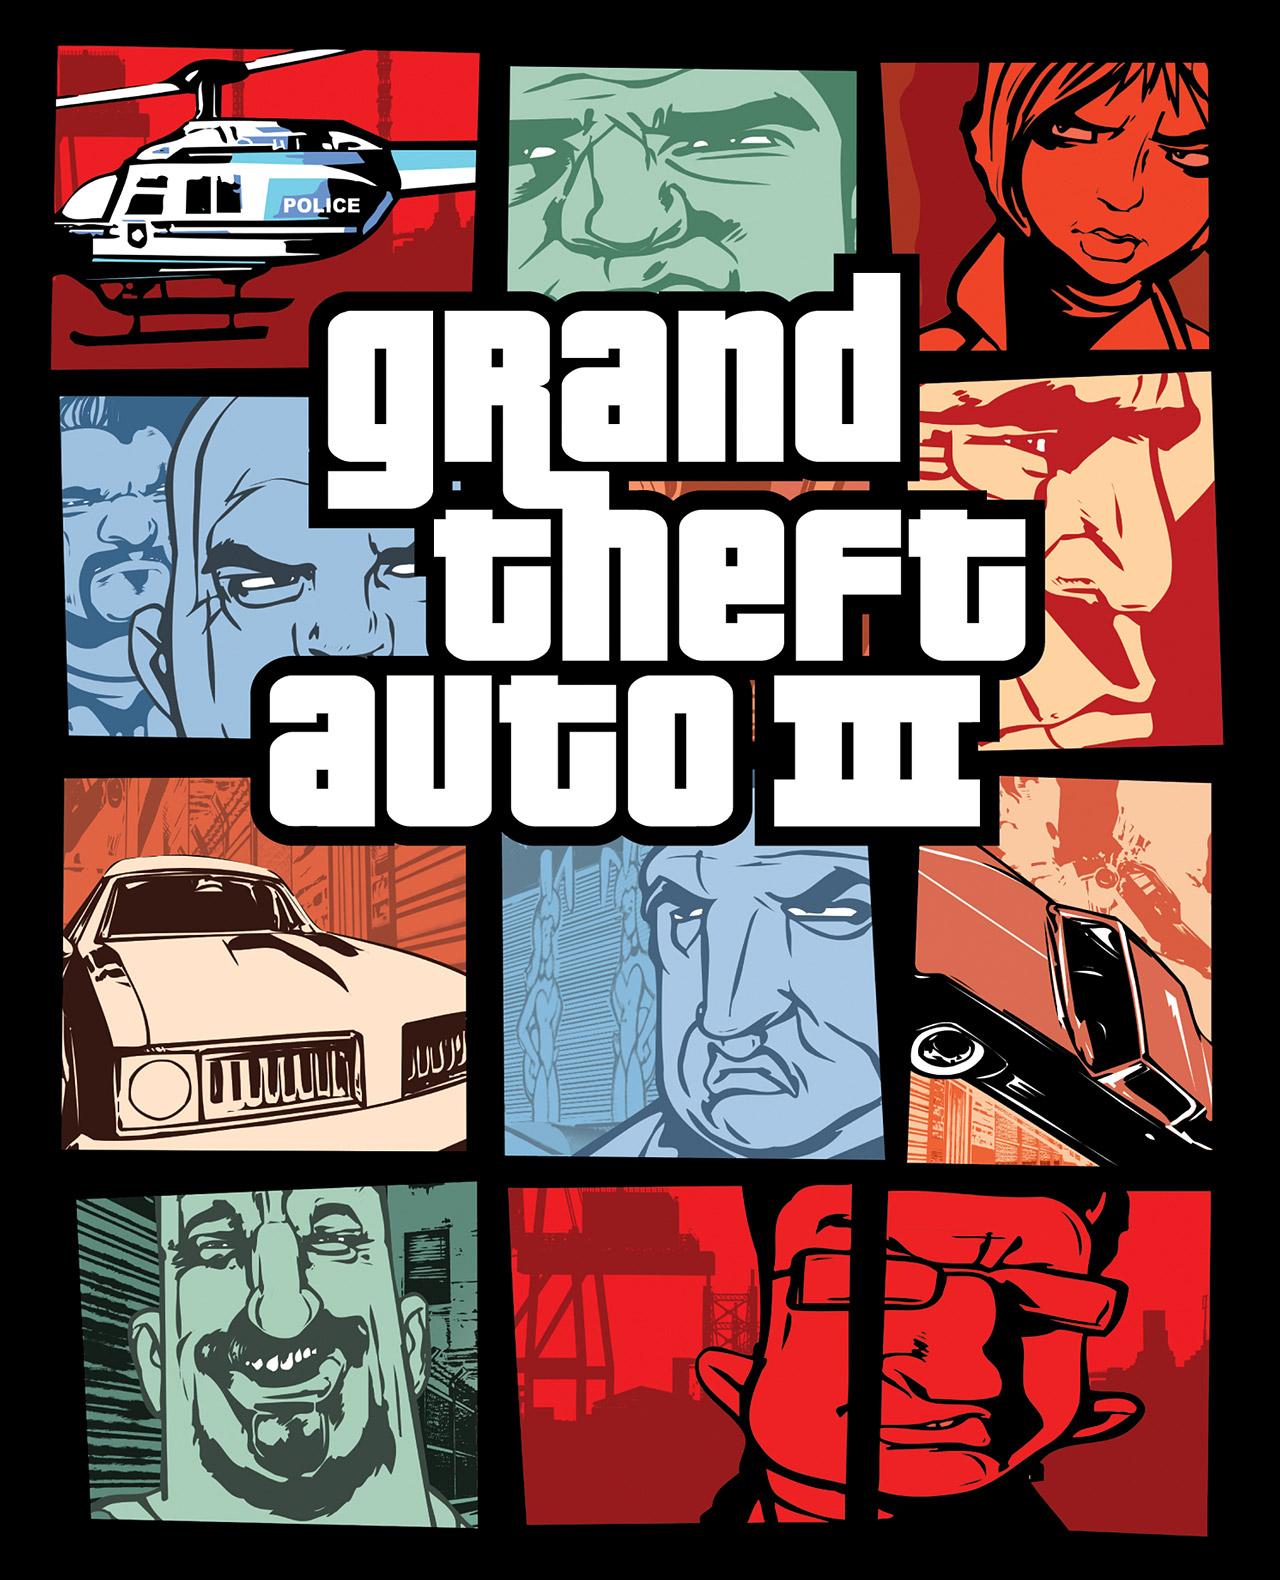 Grand theft auto iii gta wiki the grand theft auto wiki gta iv